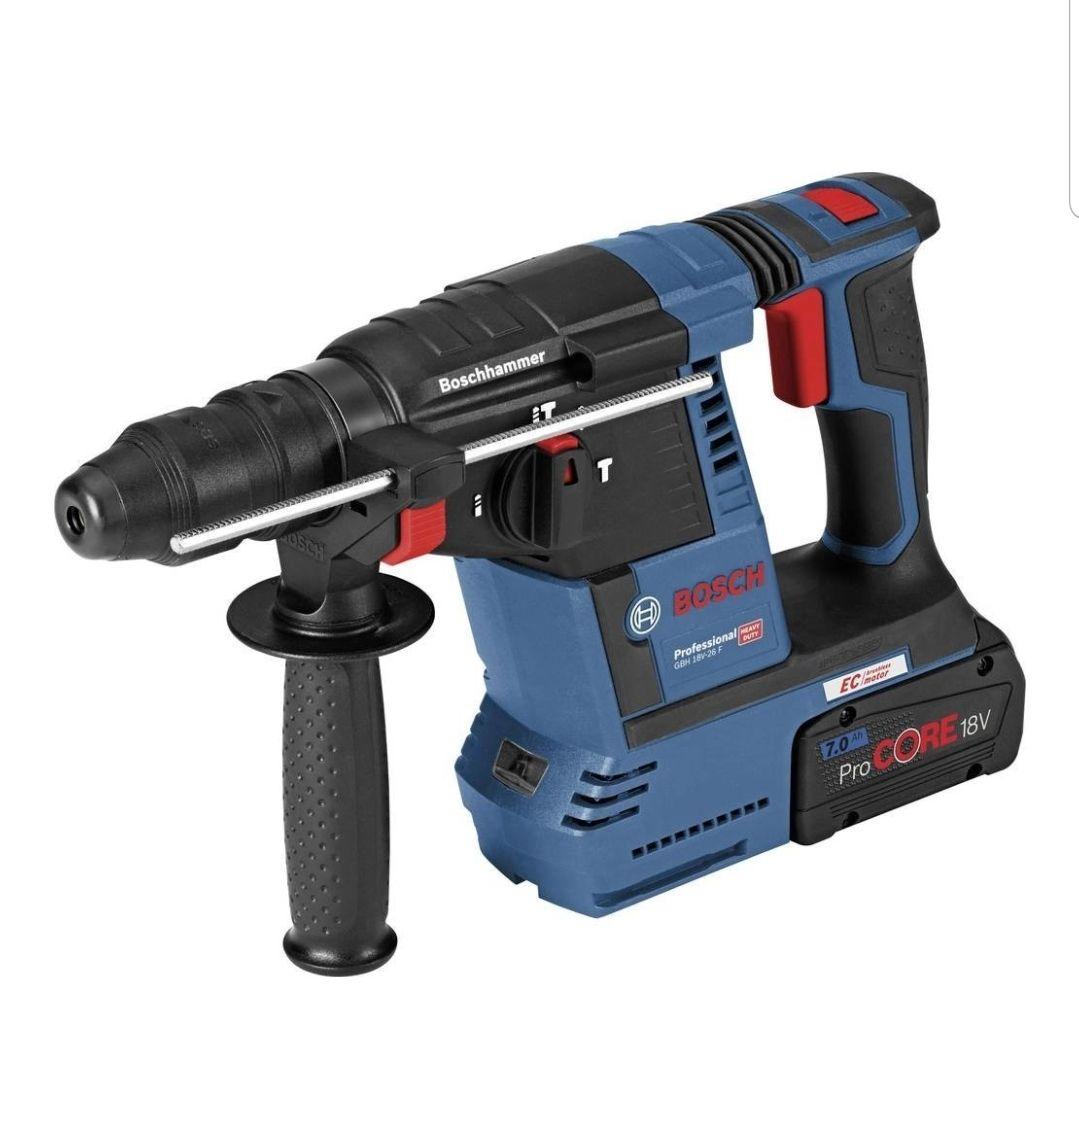 Bosch - Akku-Bohrhammer mit SDS plus GBH 18V-26 F mit 1 x 6.0 Ah Akku, ProCORE18V 8.0 Ah + gegebenenfalls Porto 4,90 €